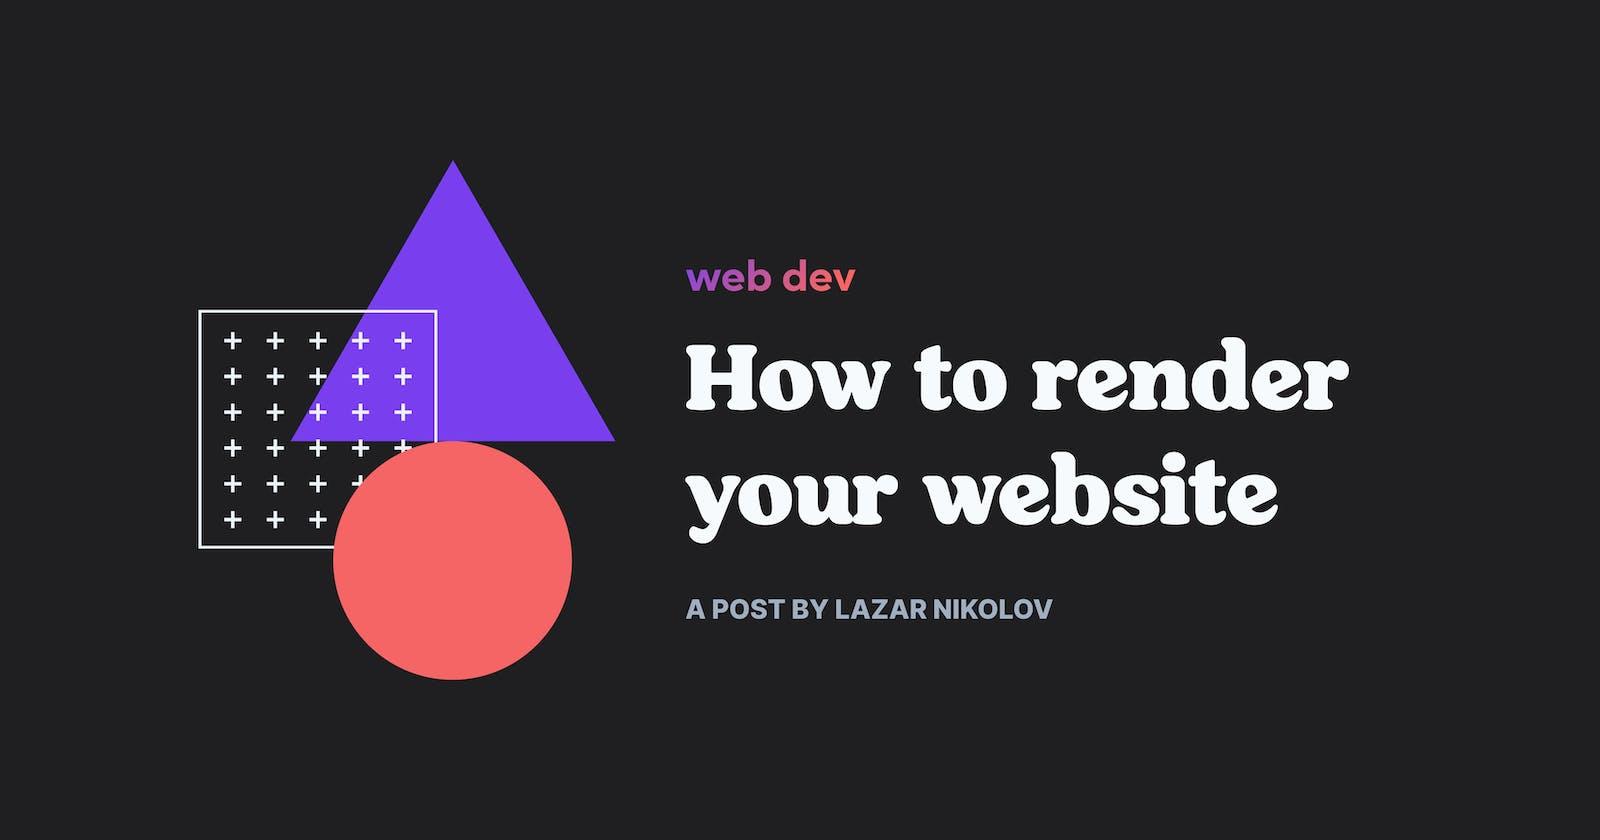 How to render your website